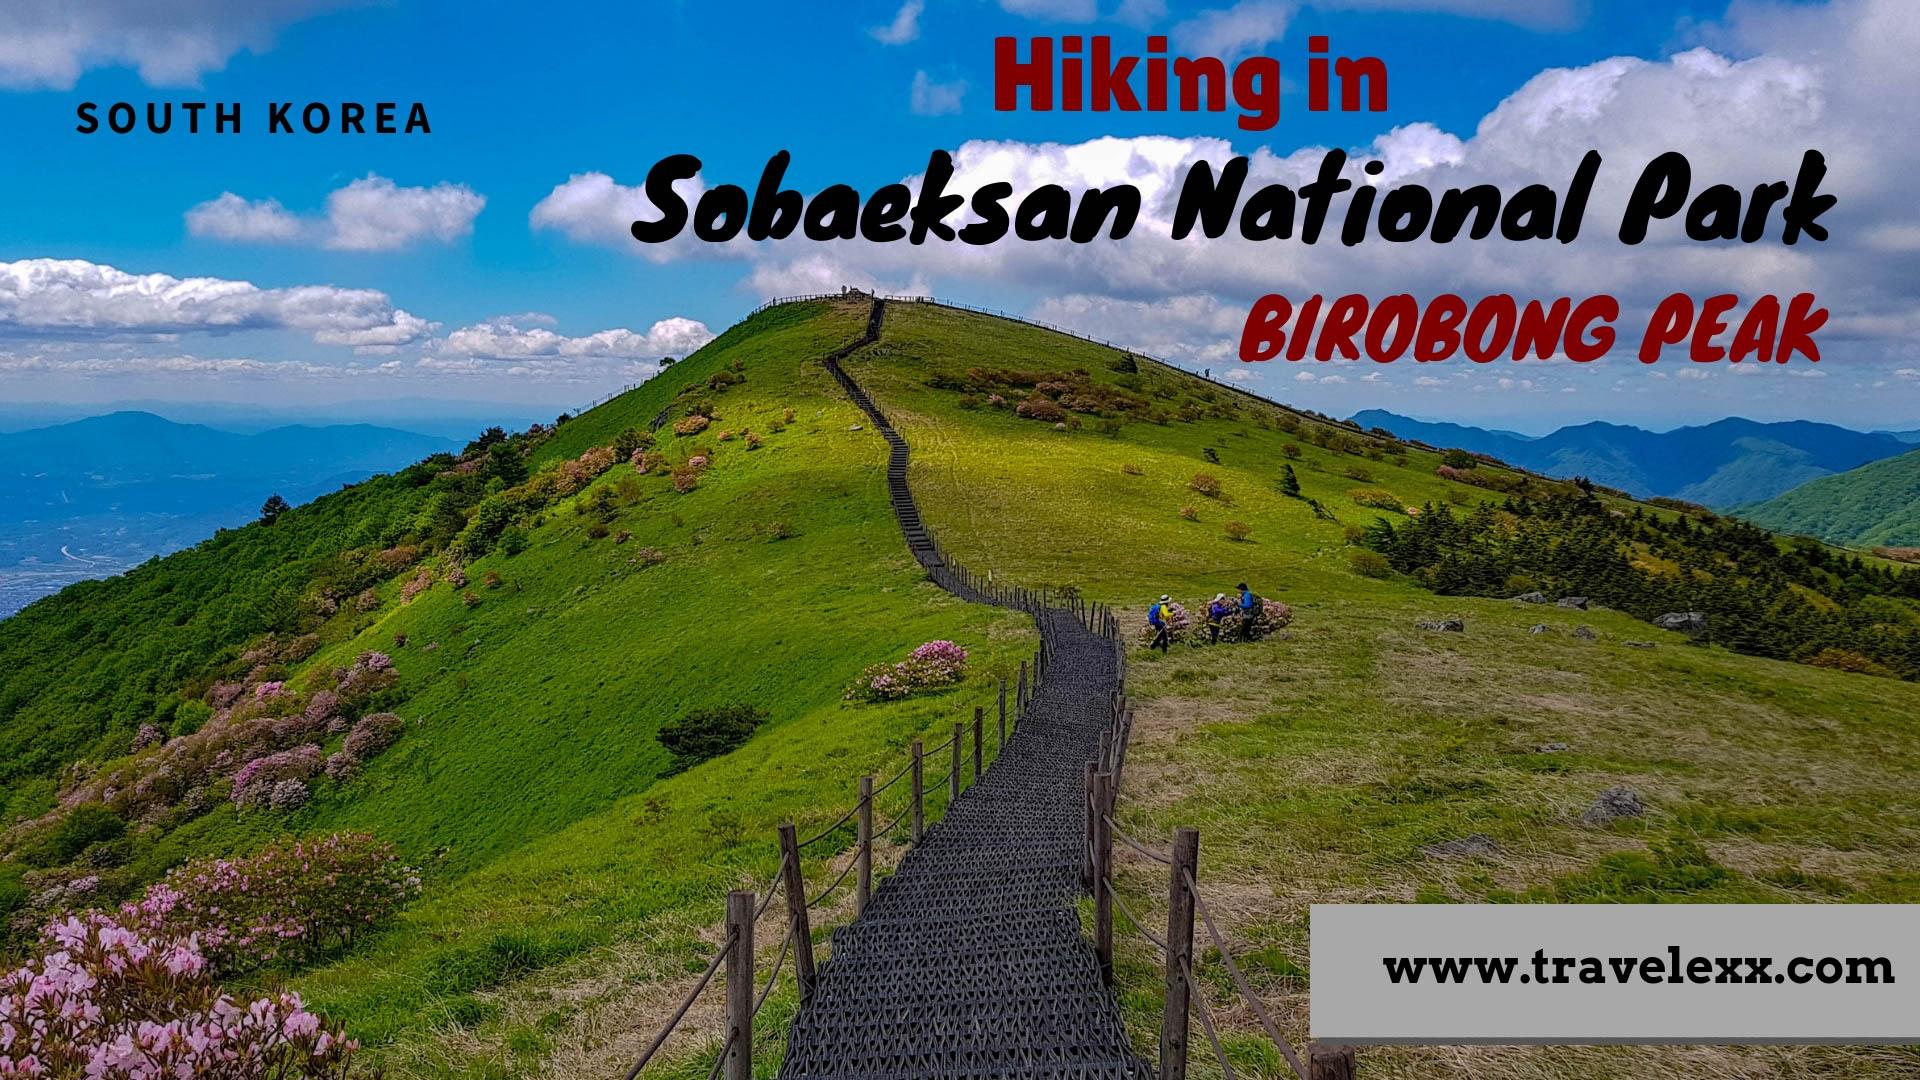 sobaeksan_featured-3